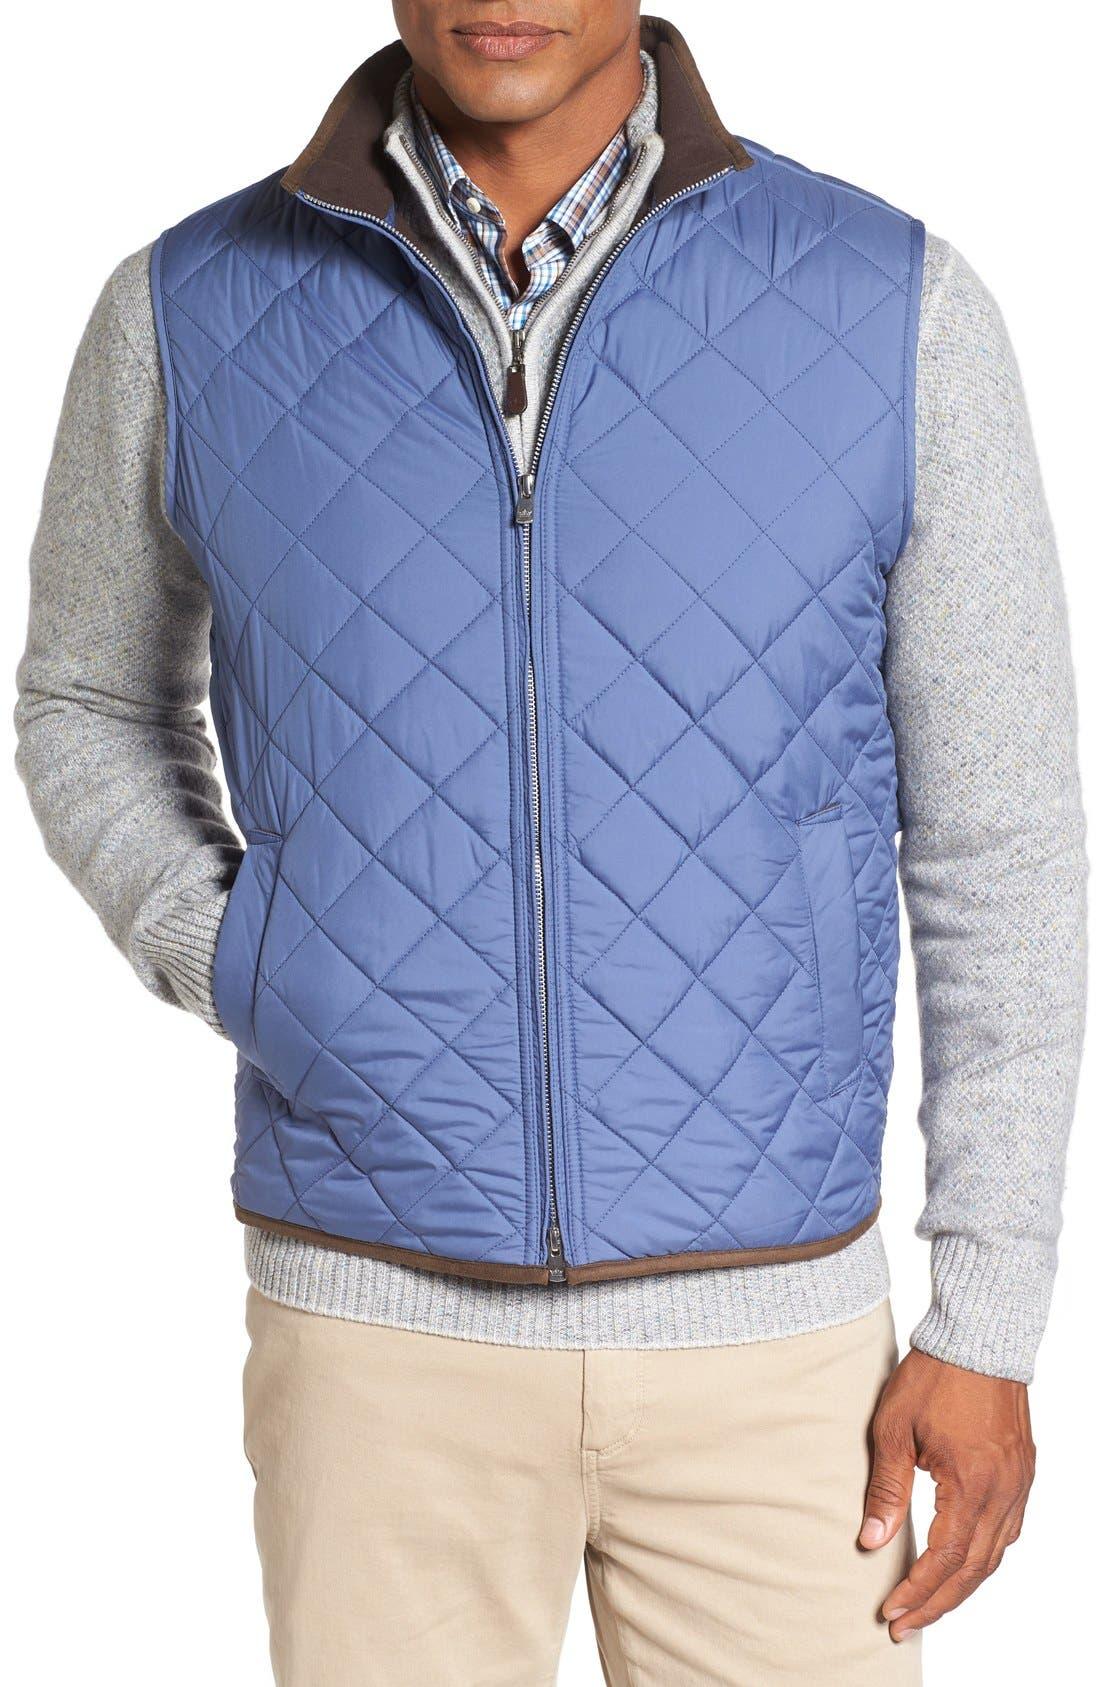 Main Image - Peter Millar 'Hudson' Lightweight Quilted Vest